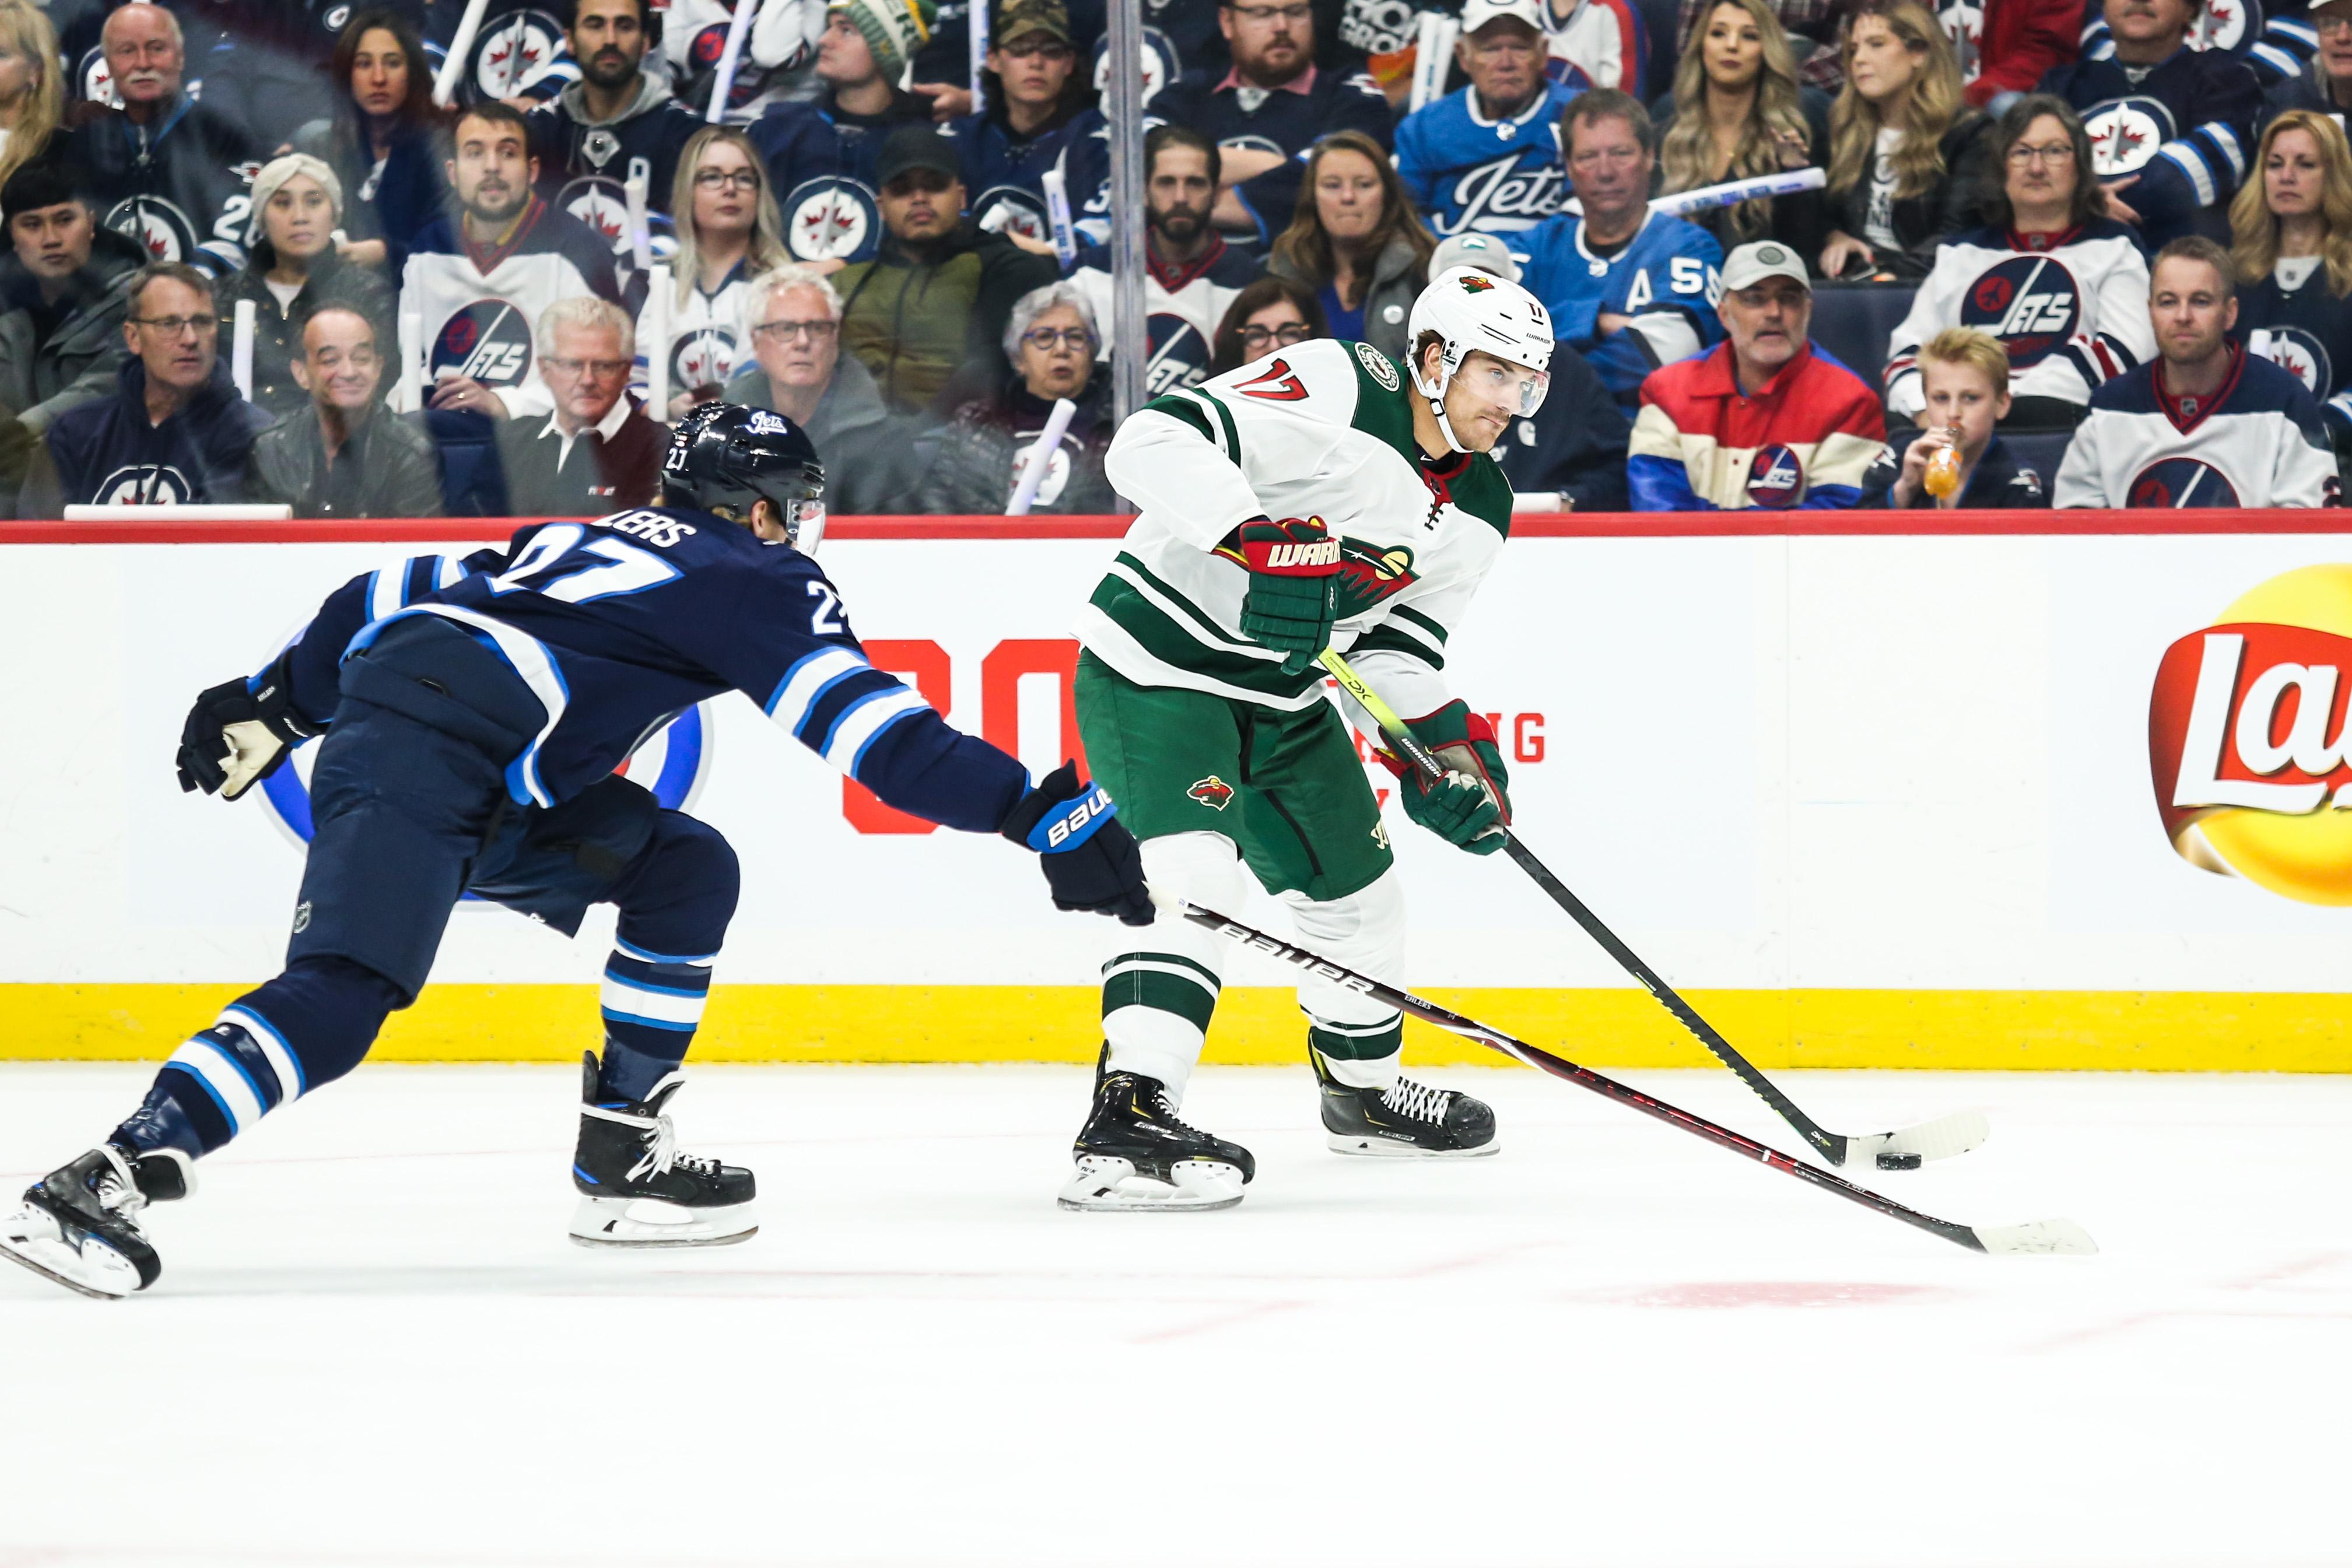 Game Preview: Minnesota Wild vs. Winnipeg Jets  12/21/19 @ 1:00PM CST at Xcel Energy Center